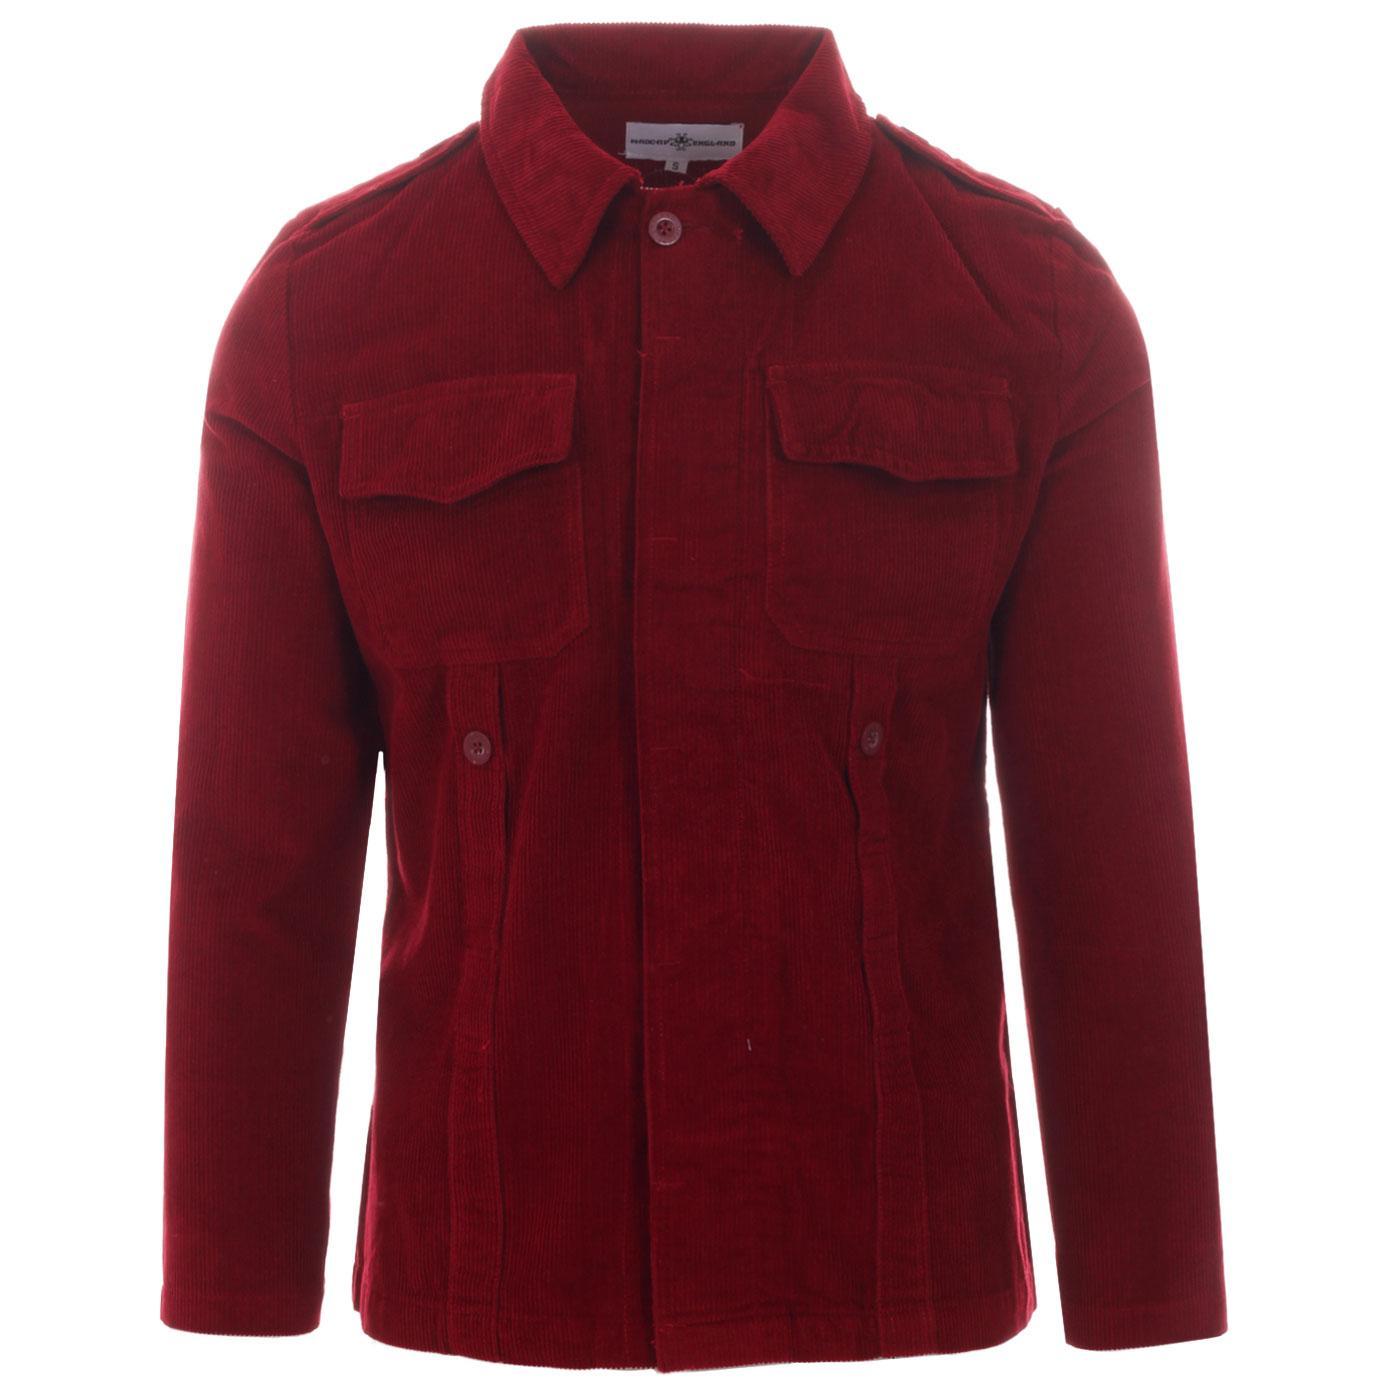 Lennon MADCAP ENGLAND Mod Cord Shirt Jacket (Port)